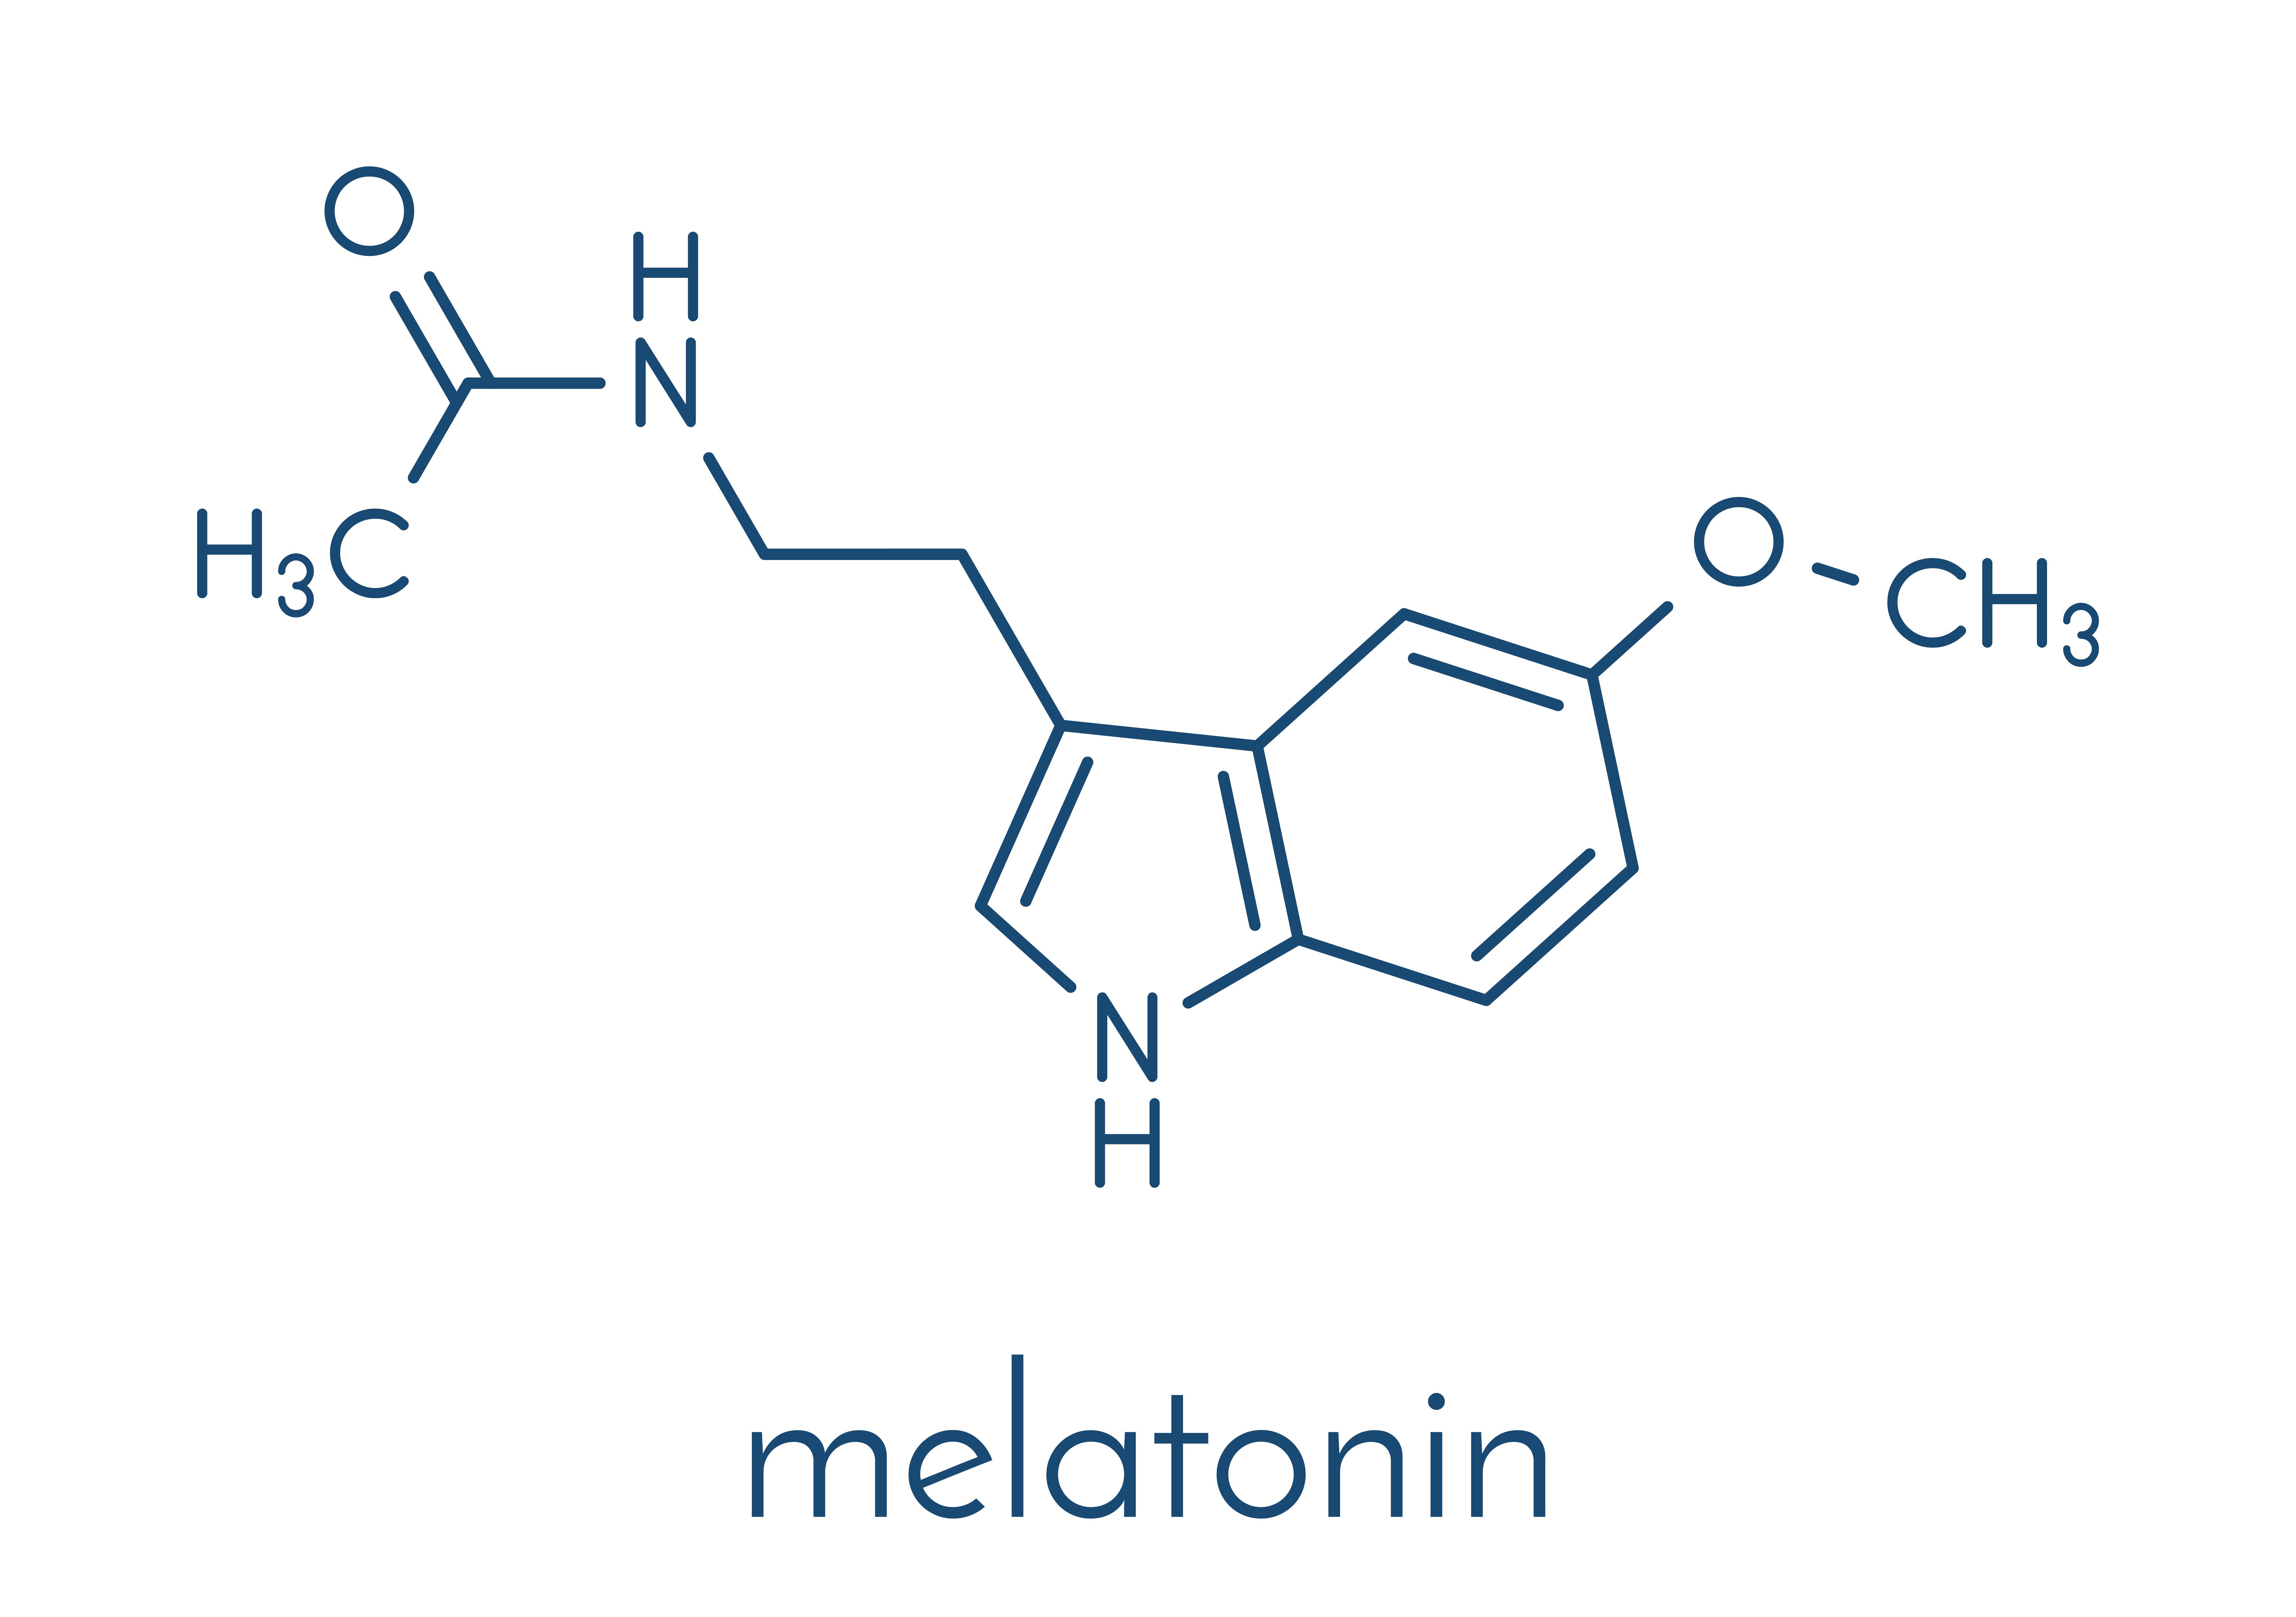 Chemical formulation of melatonin